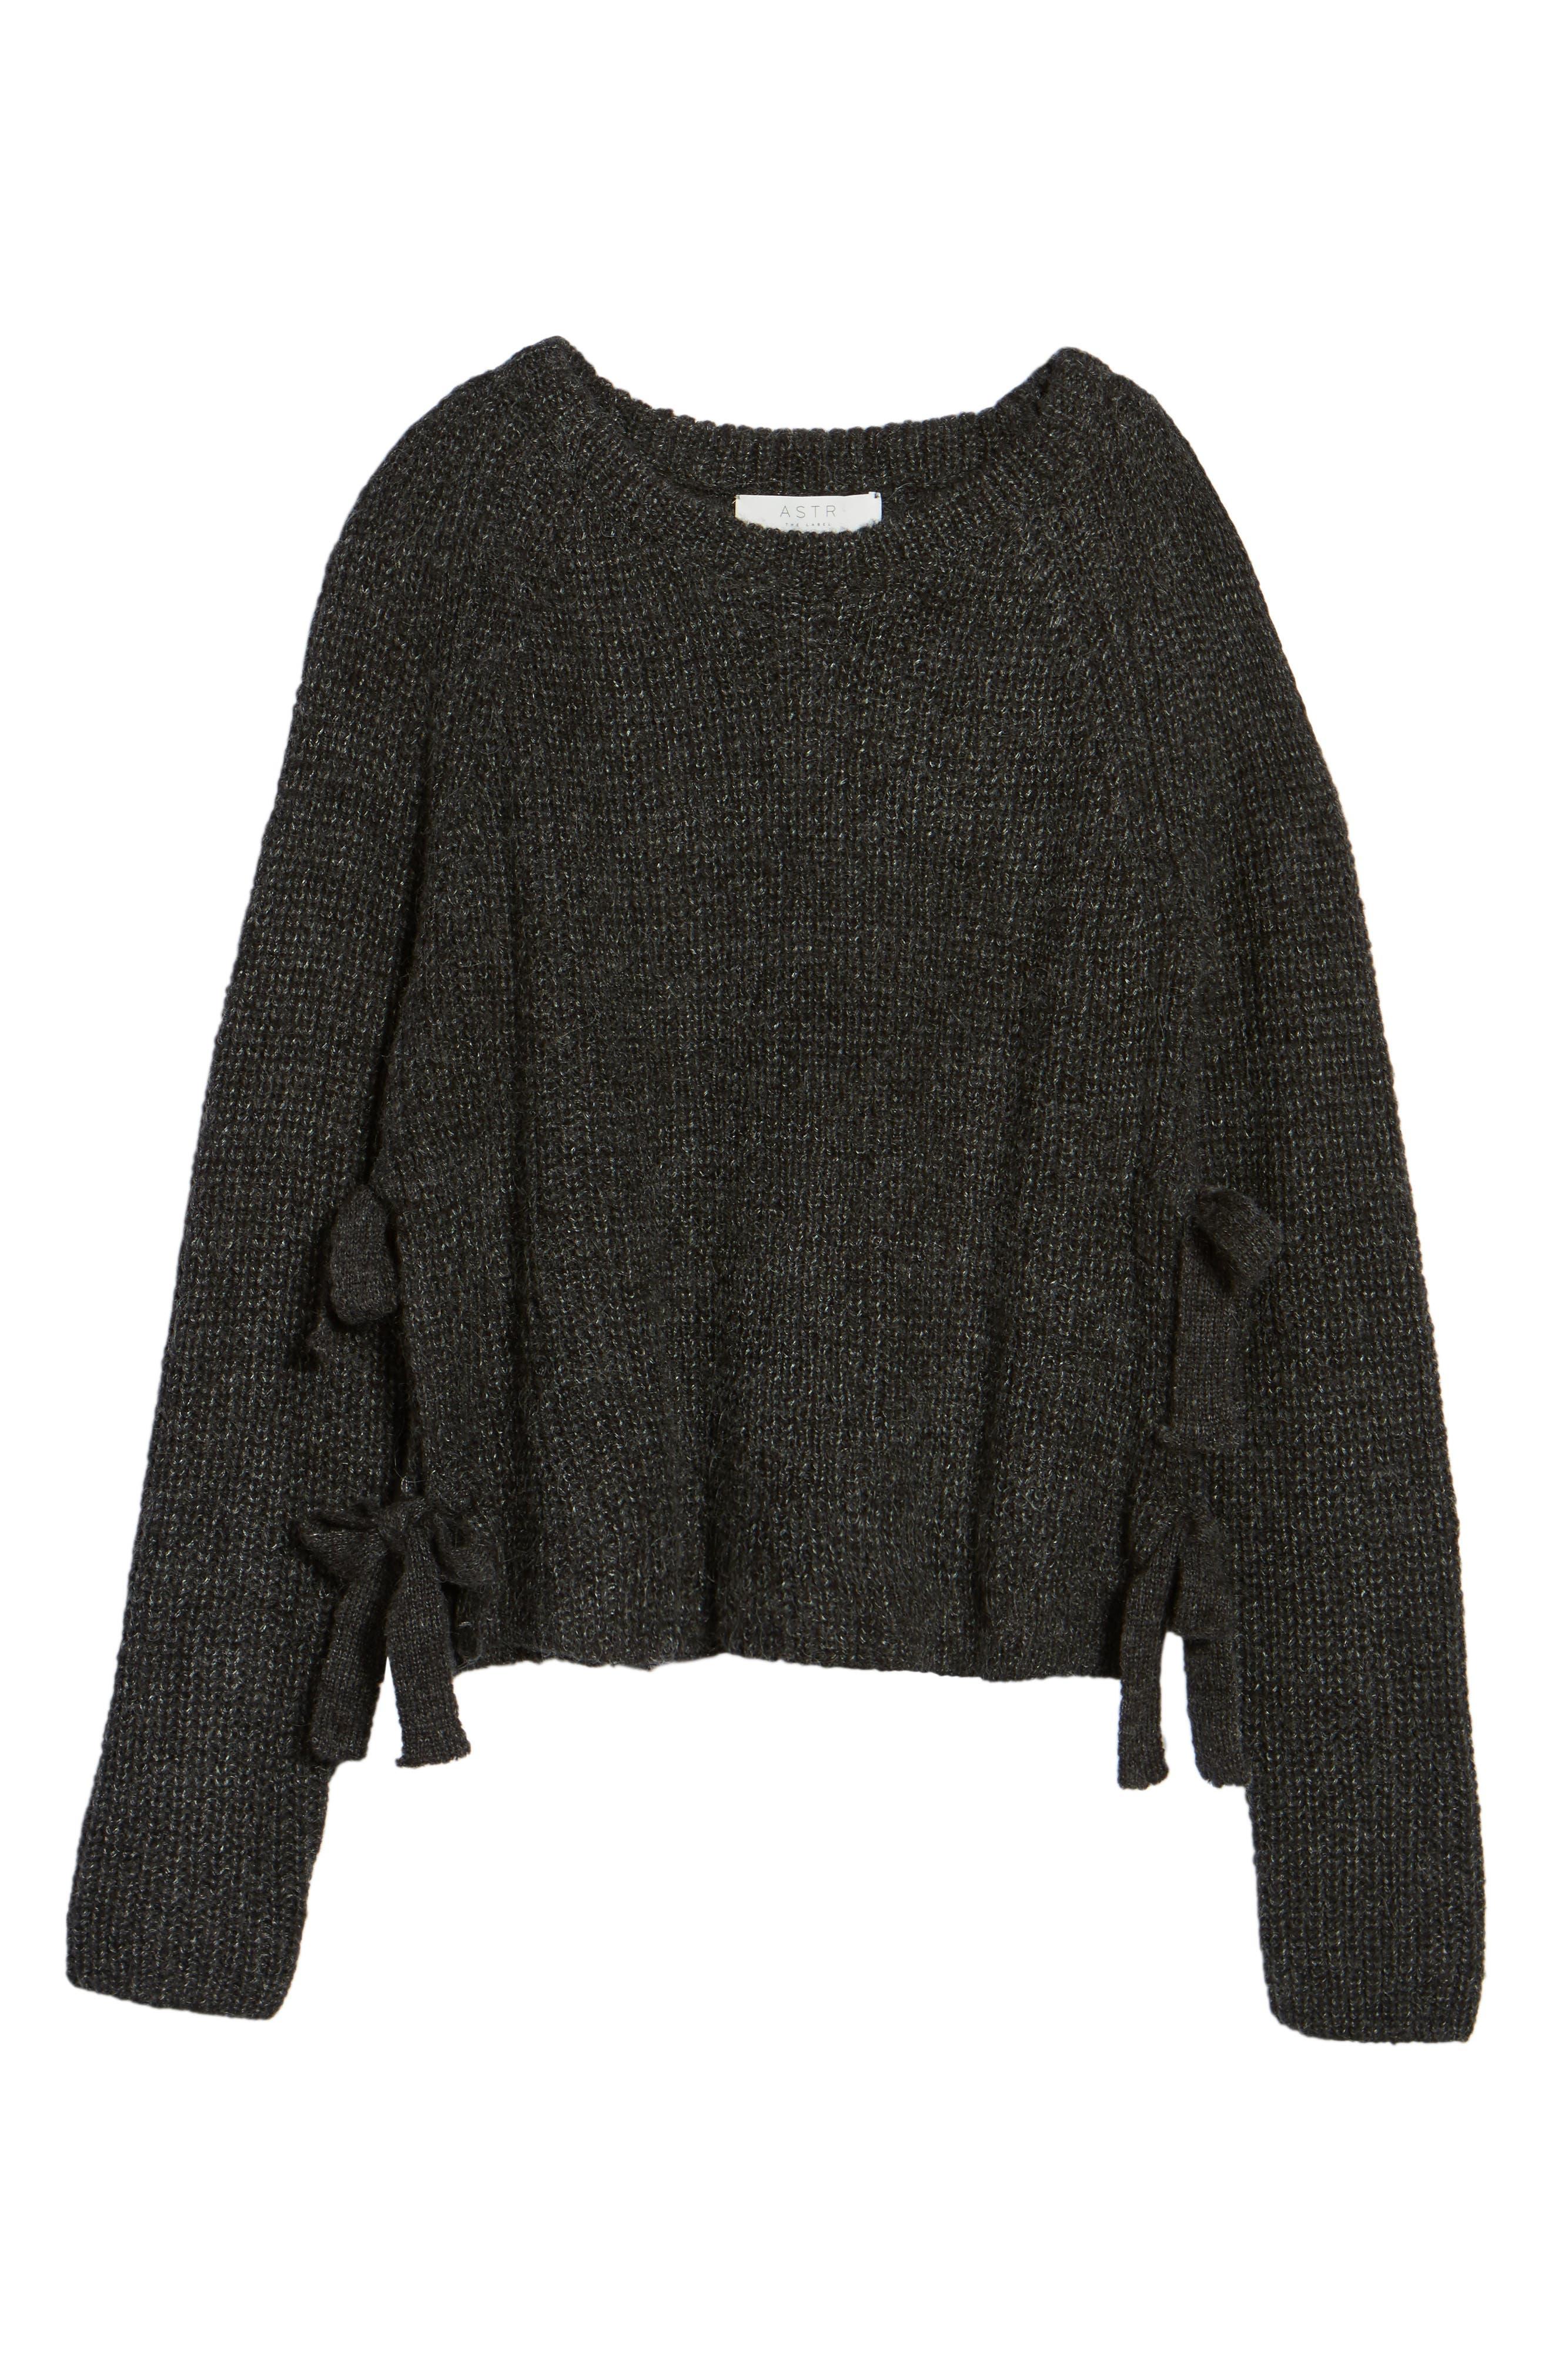 Lexie Side Tie Sweater,                             Alternate thumbnail 6, color,                             020